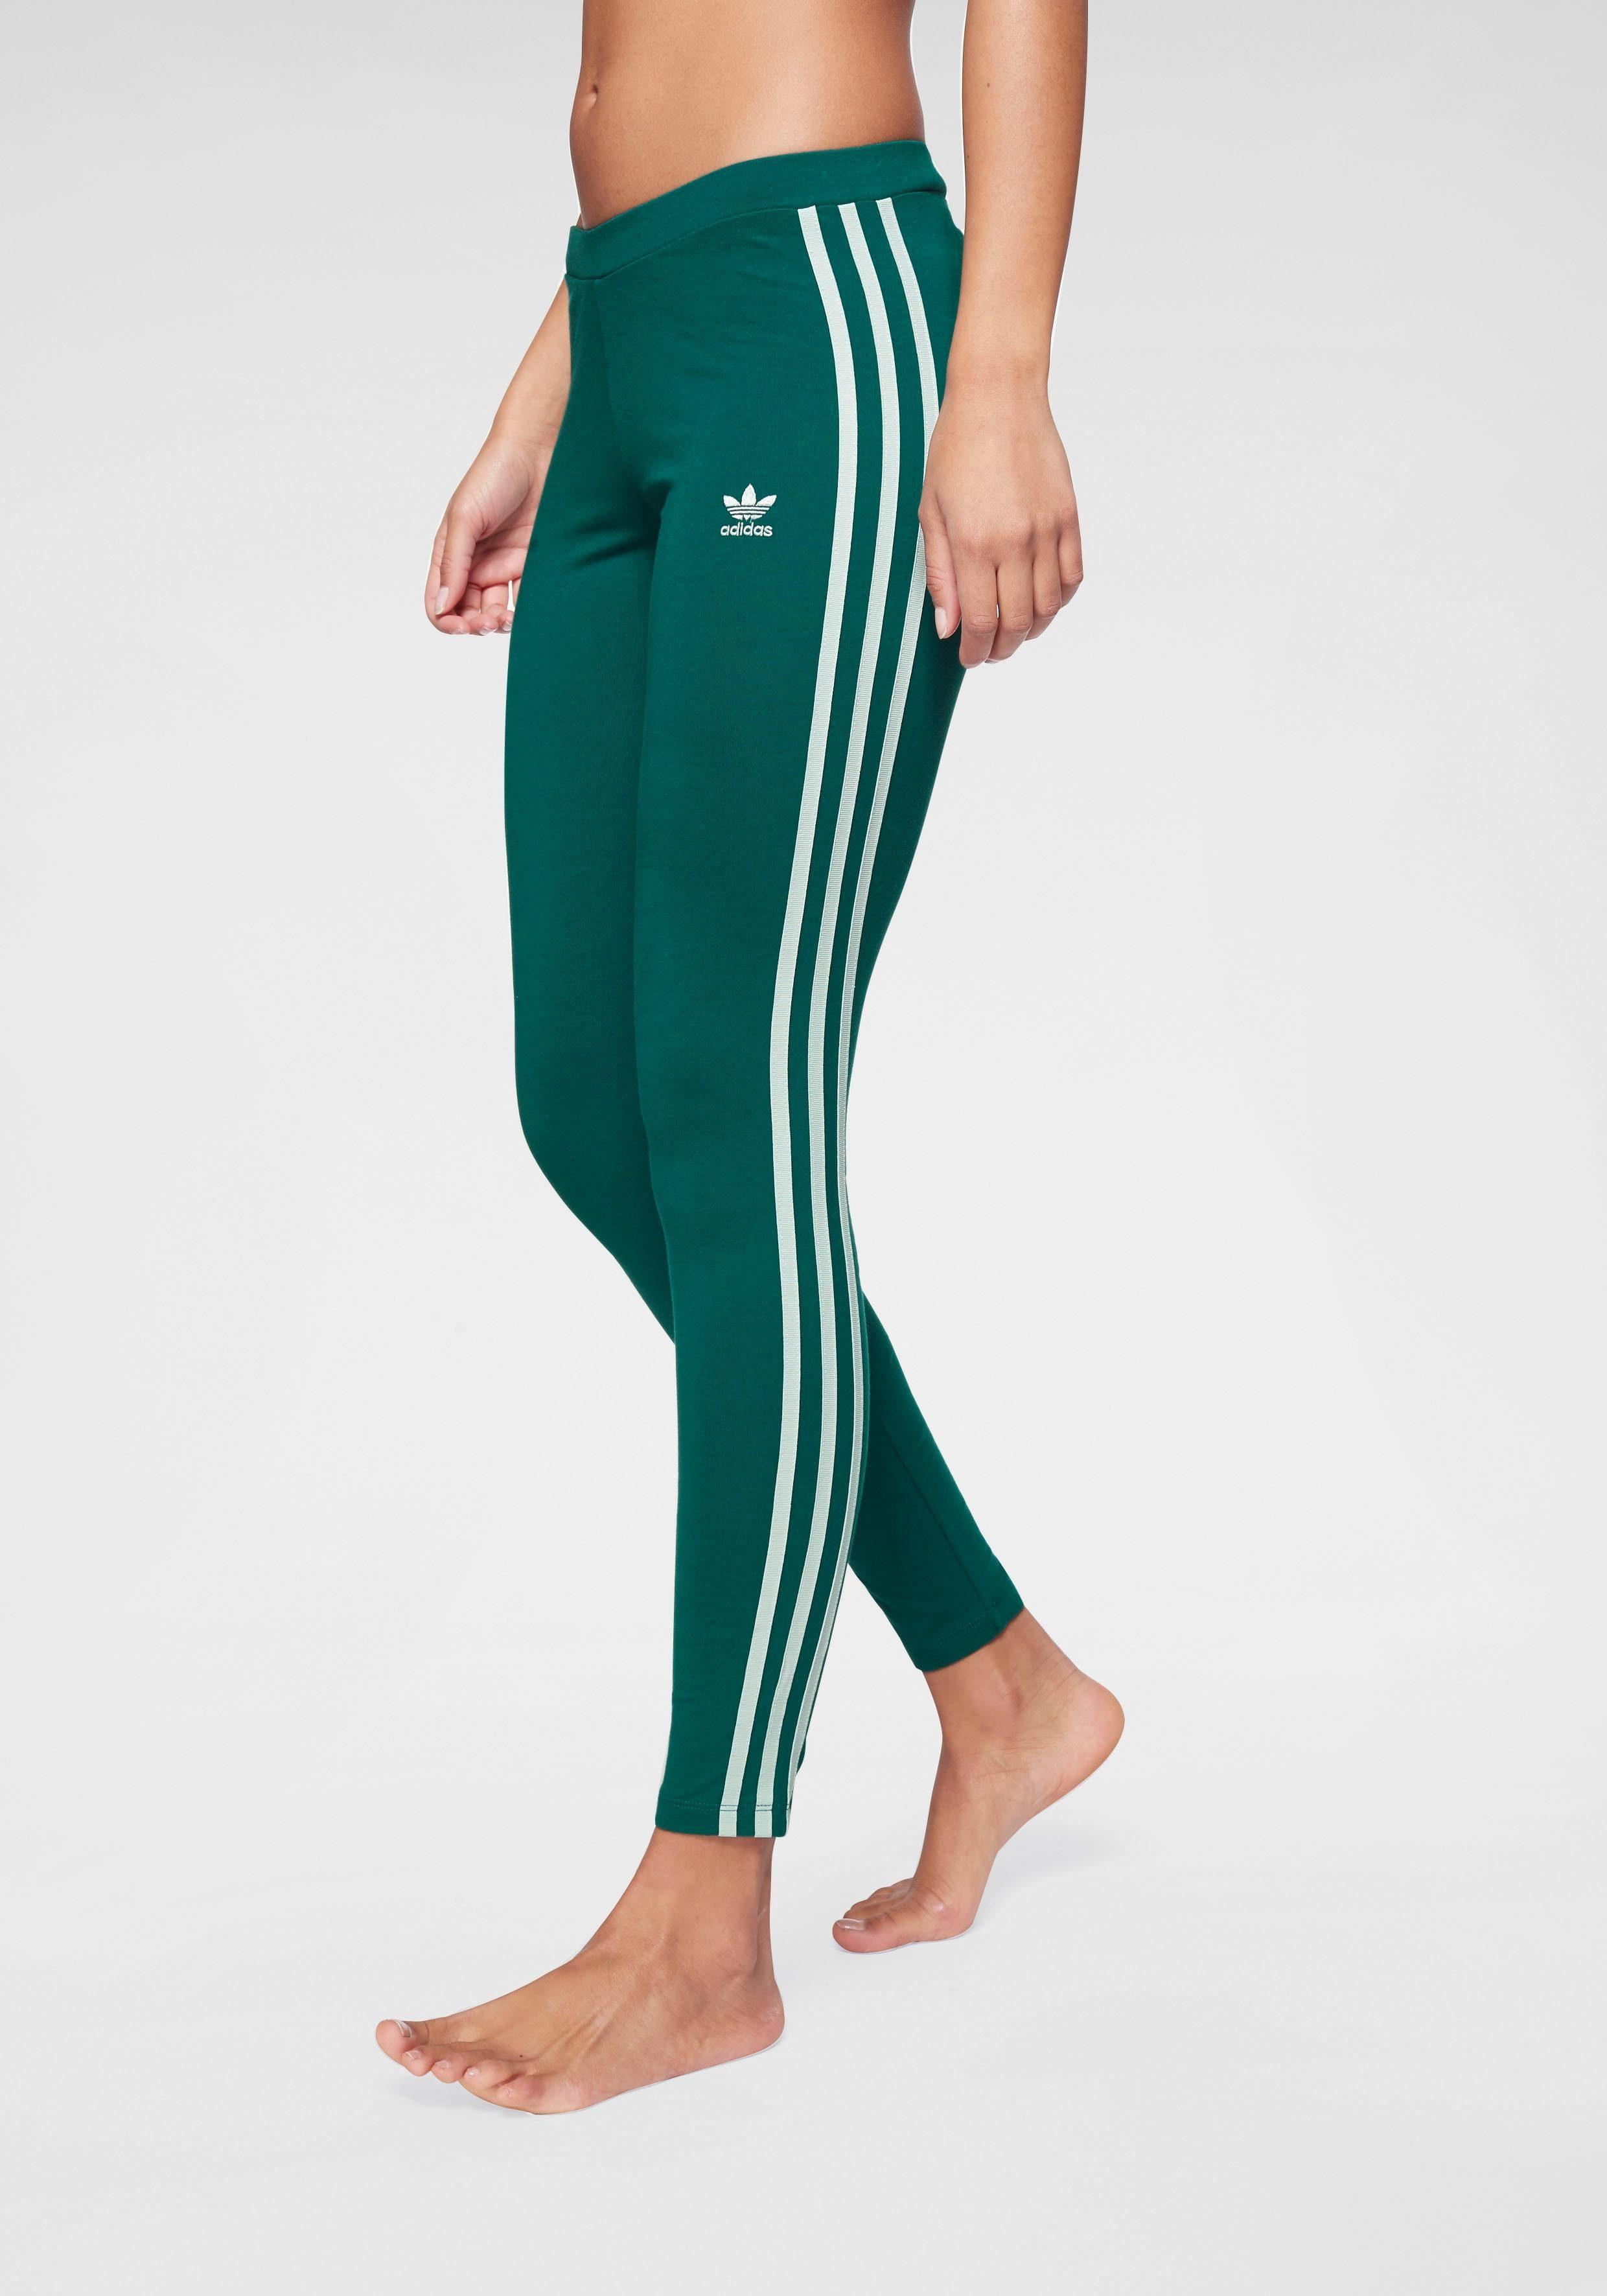 adidas Originals Leggings »3 STRIPES TIGHT« kaufen | OTTO